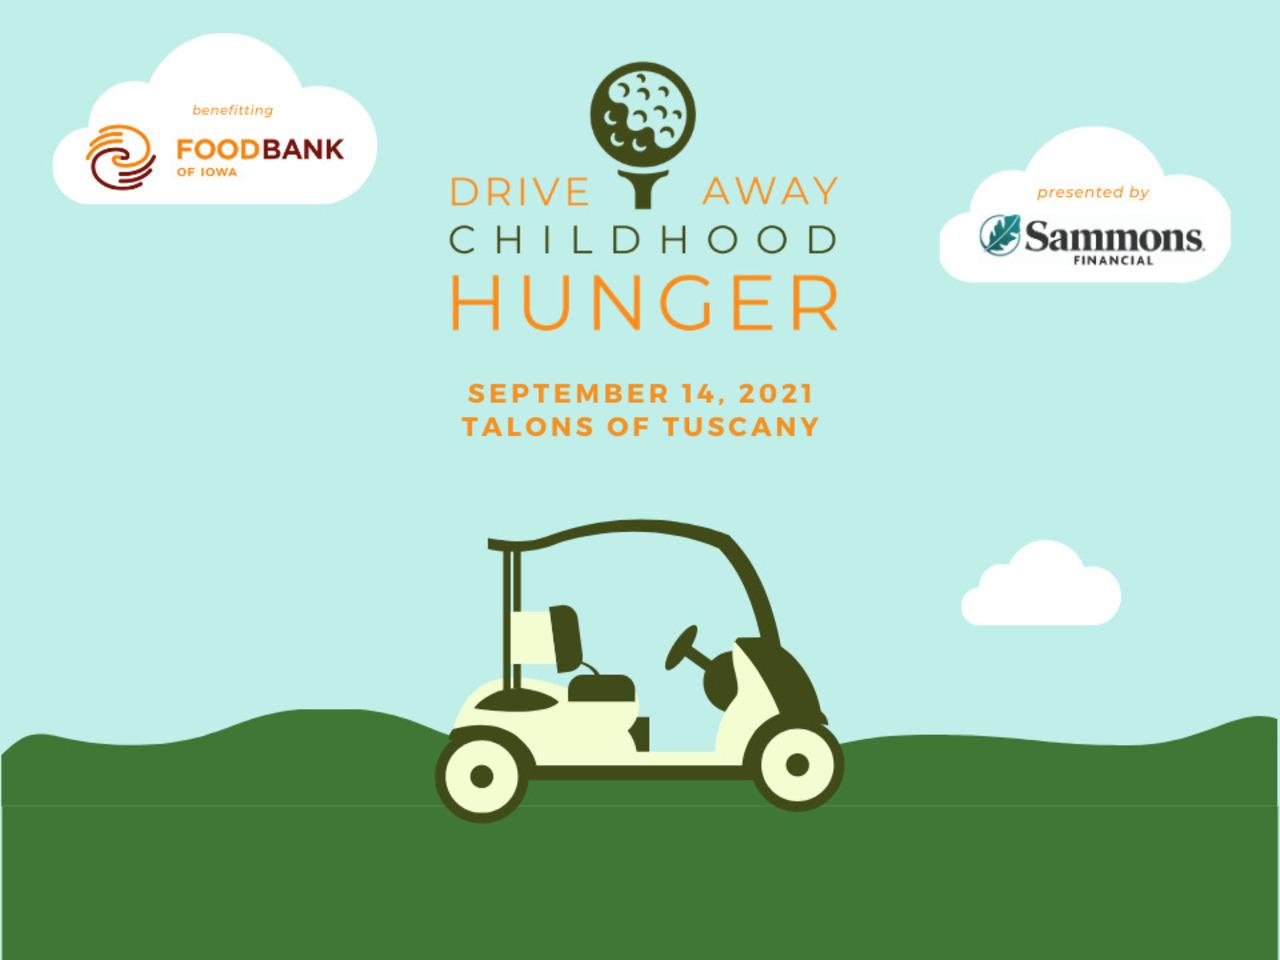 Drive Away Childhood Hunger 2021